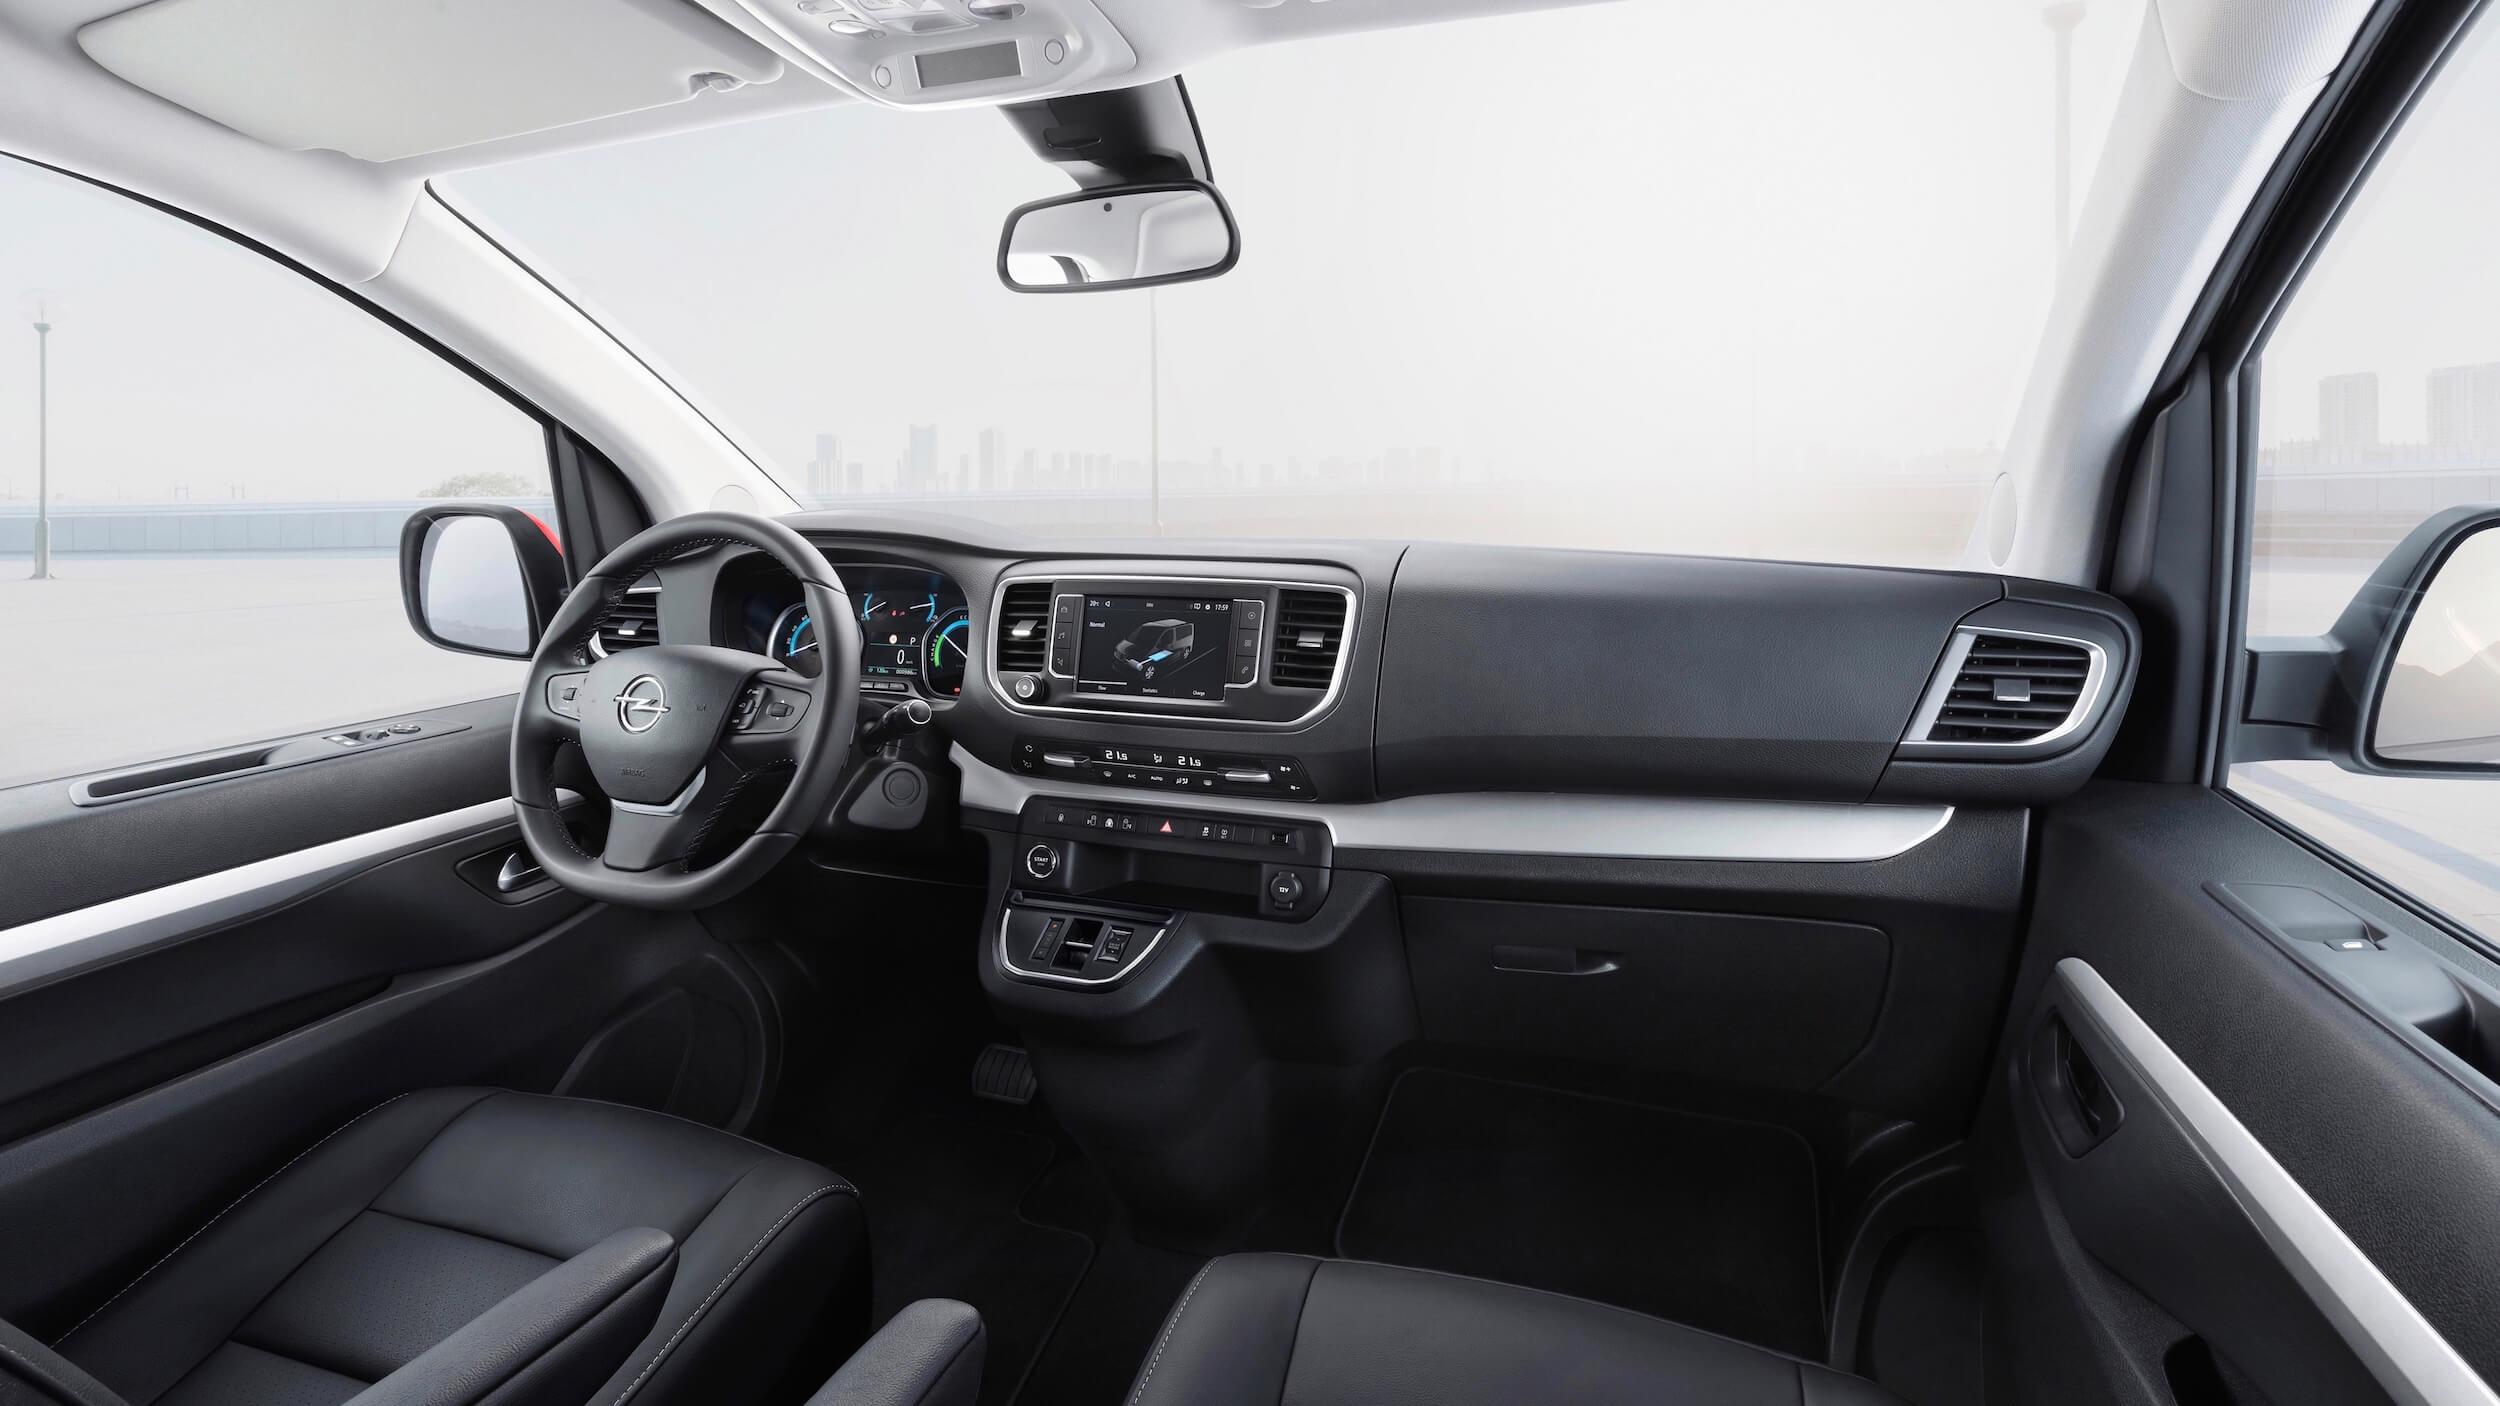 Elektrische Opel Zafira stuur en dashboard